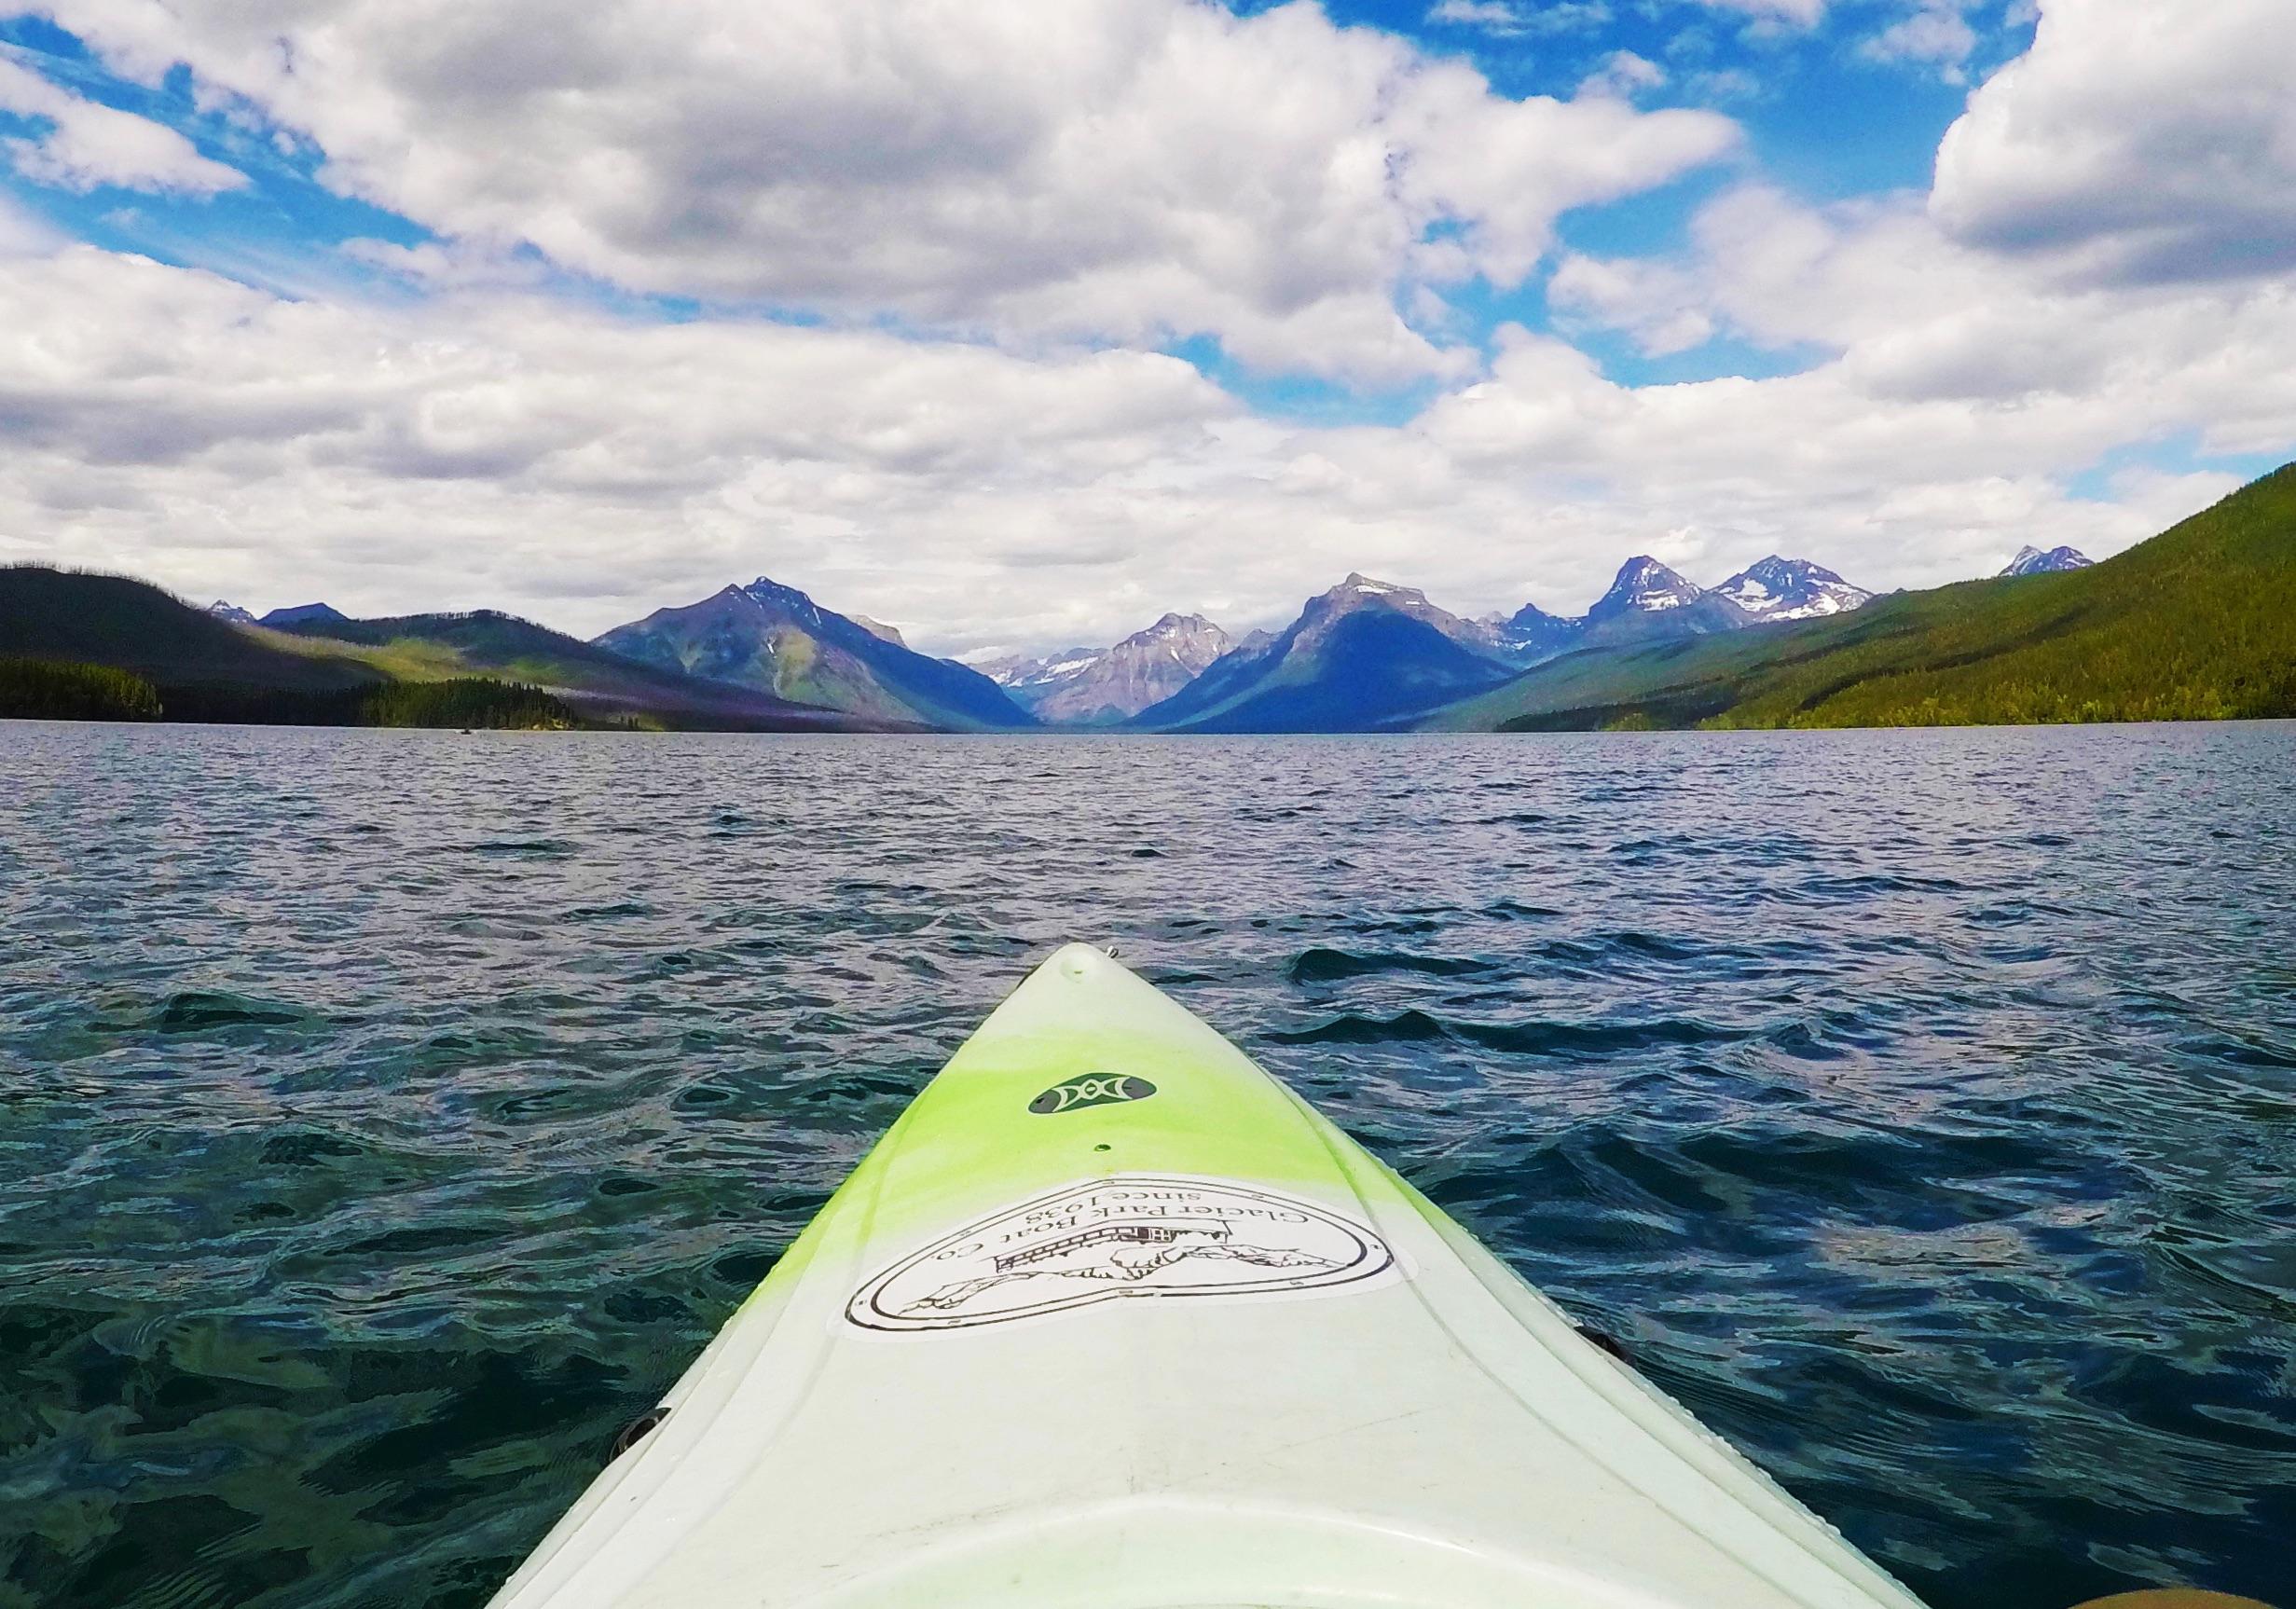 Kayaking on Lake McDonald, Glacier National Park